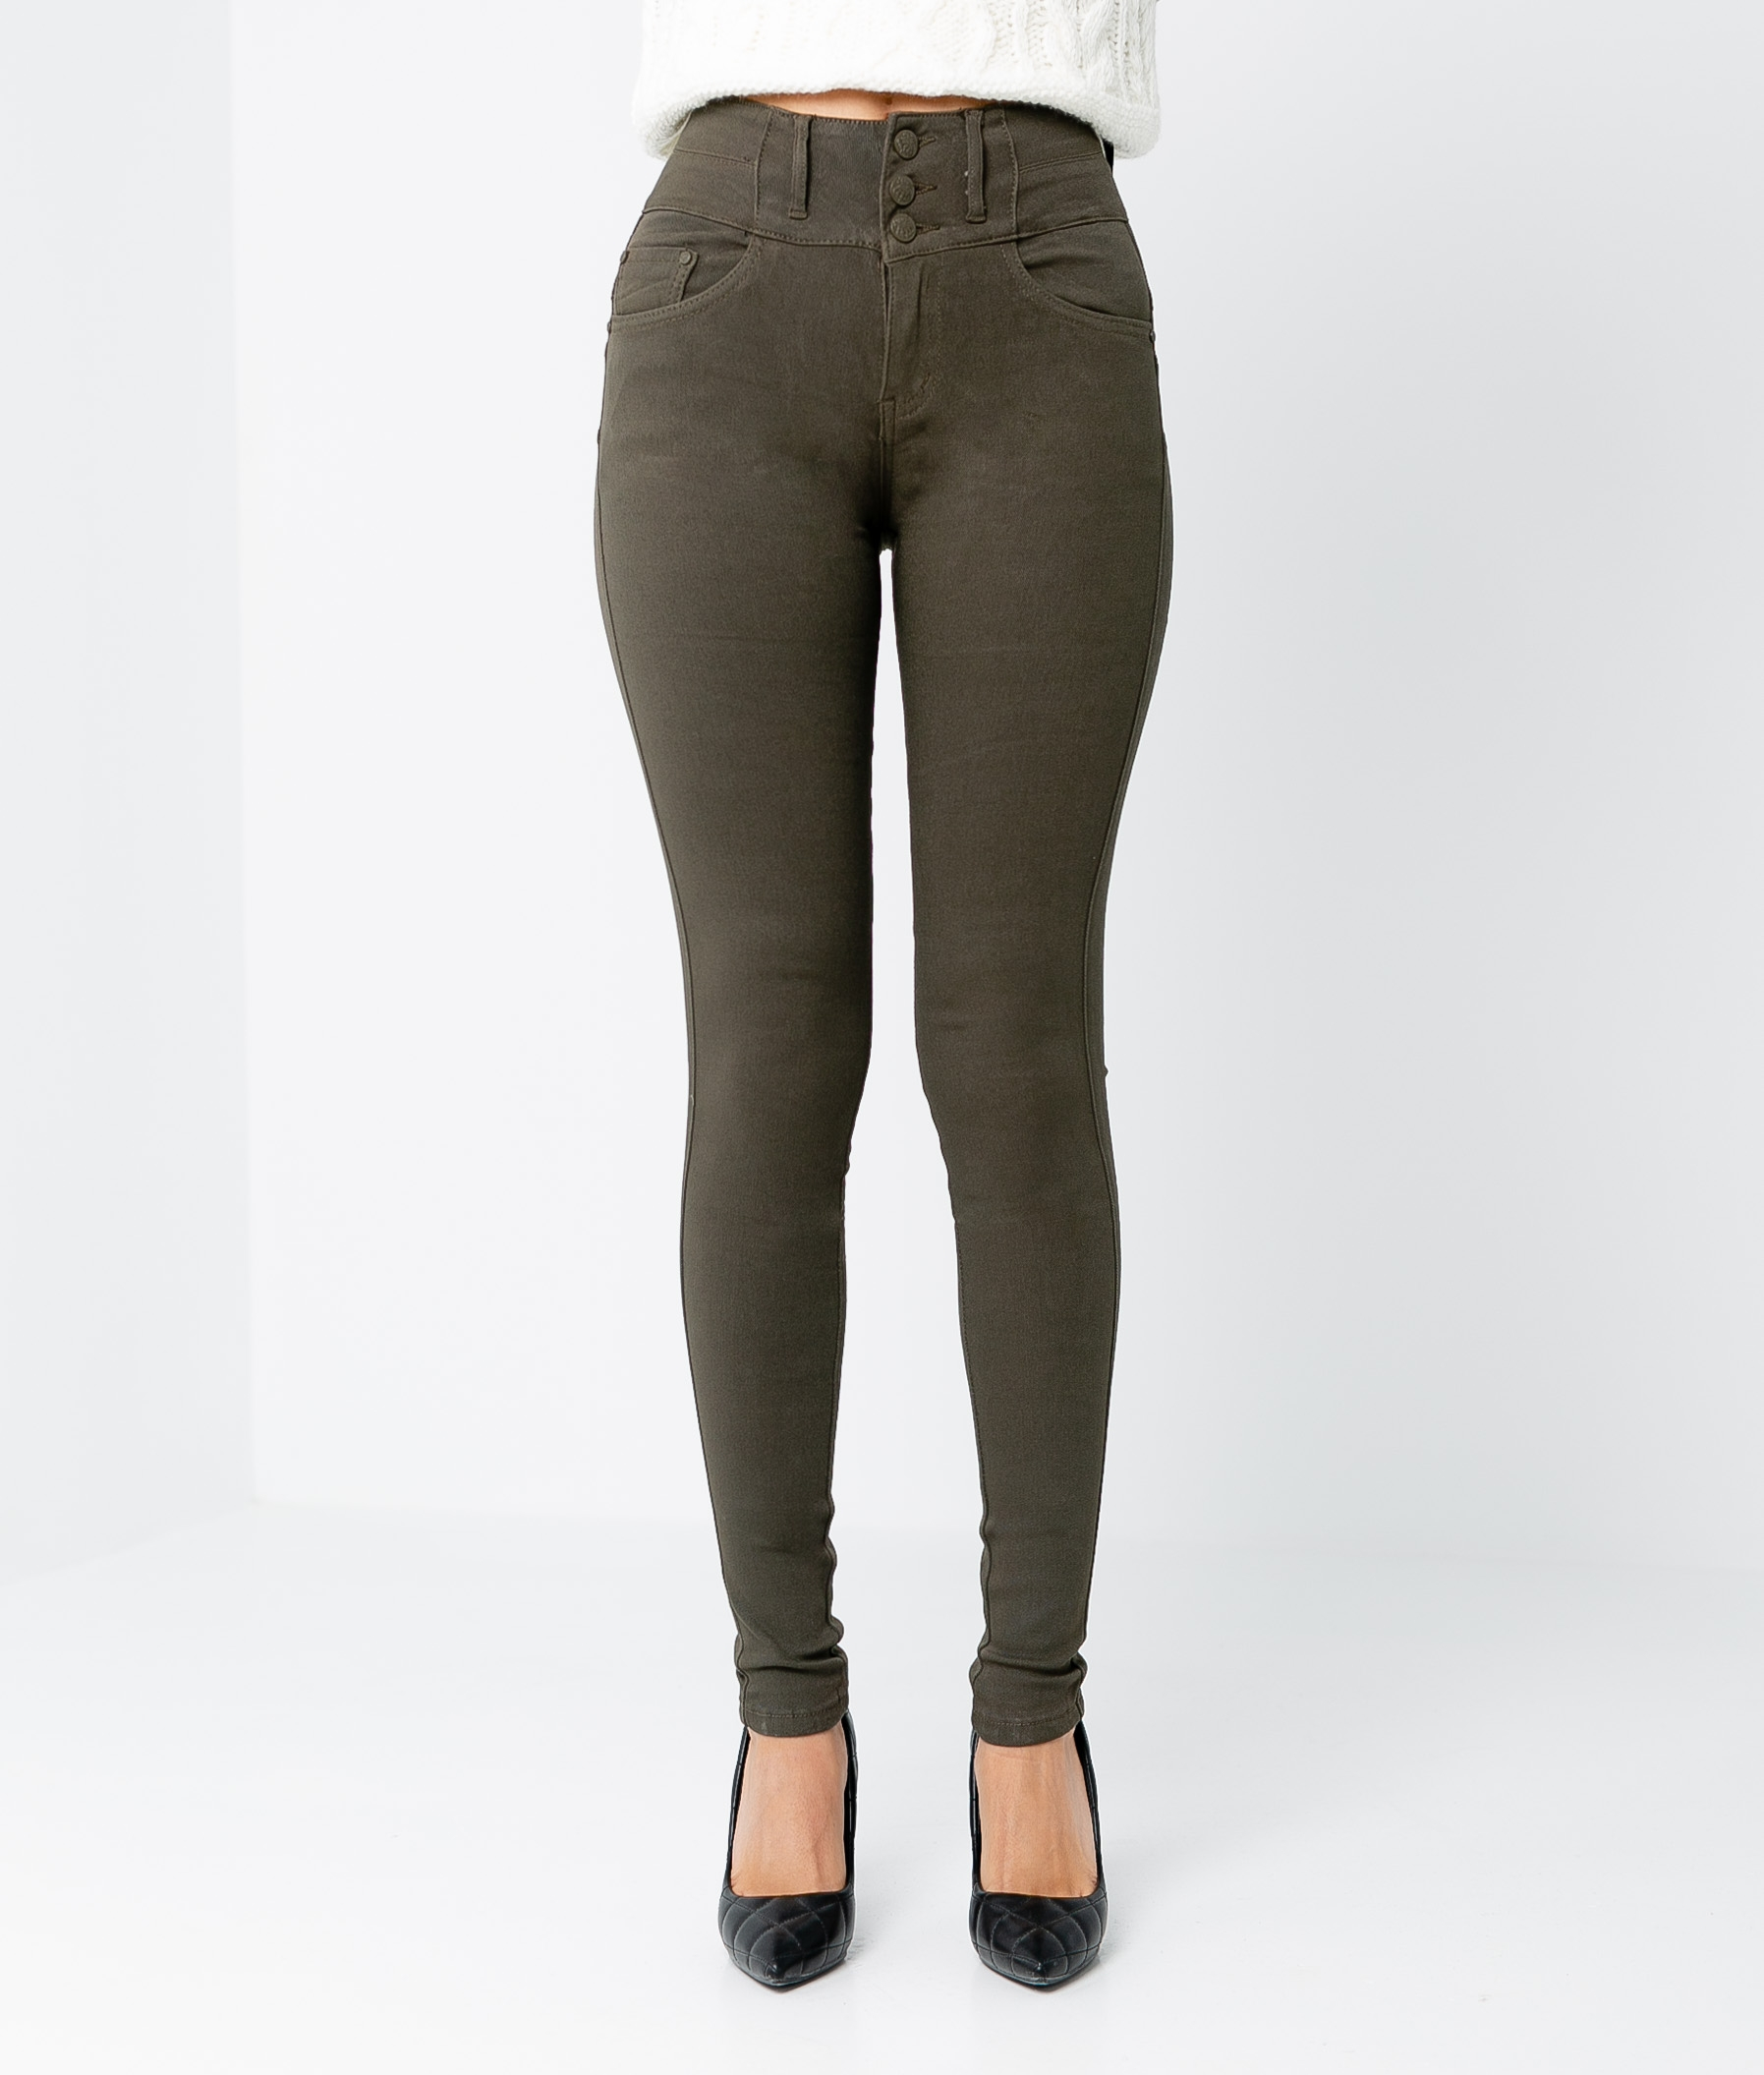 Pantaloni Subama - Cachi